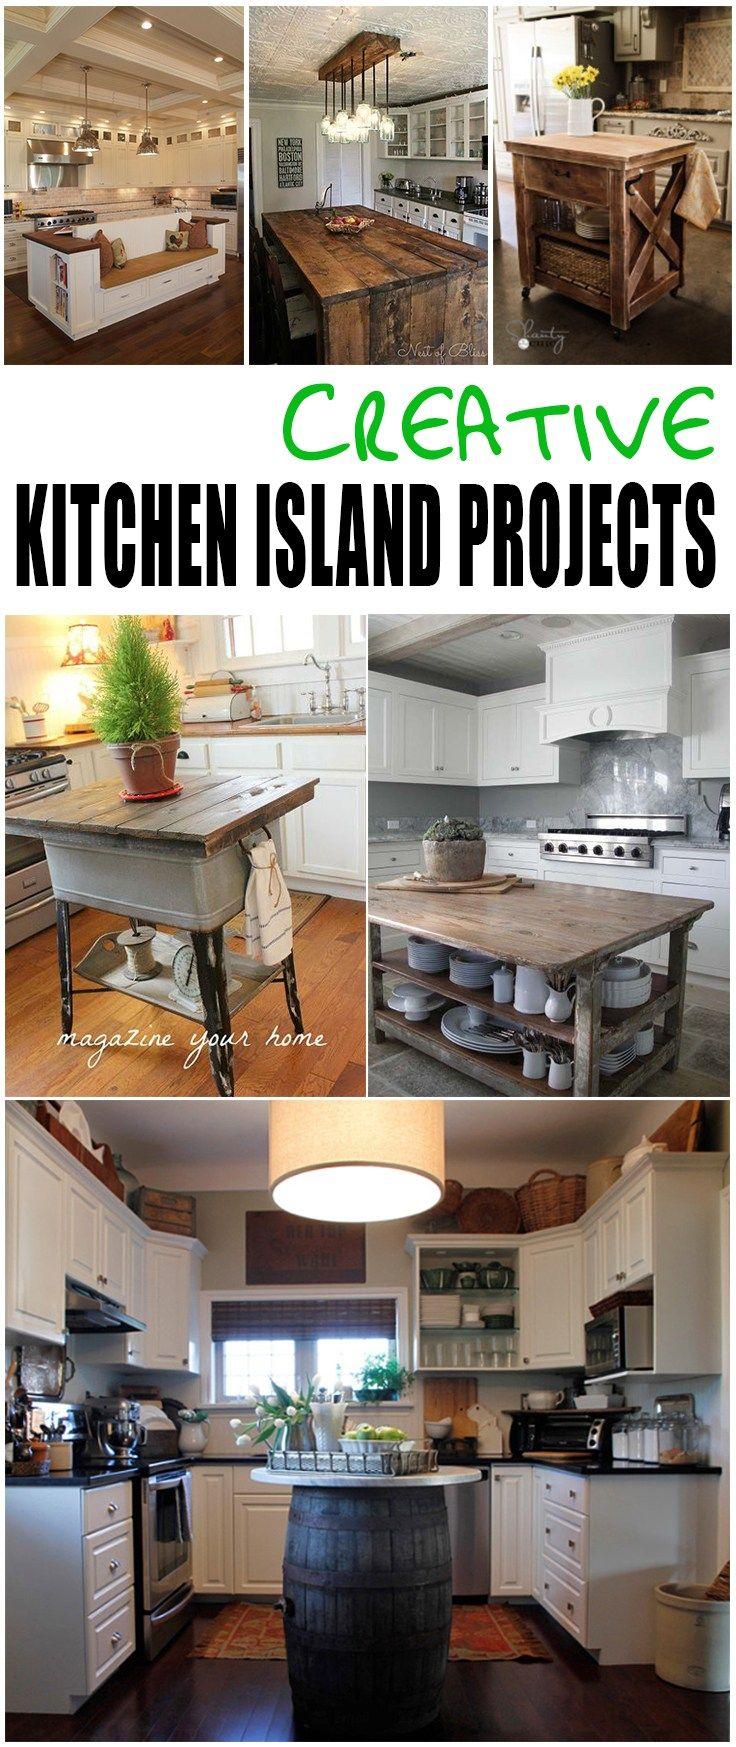 Medium Crop Of Kitchen Island Projects